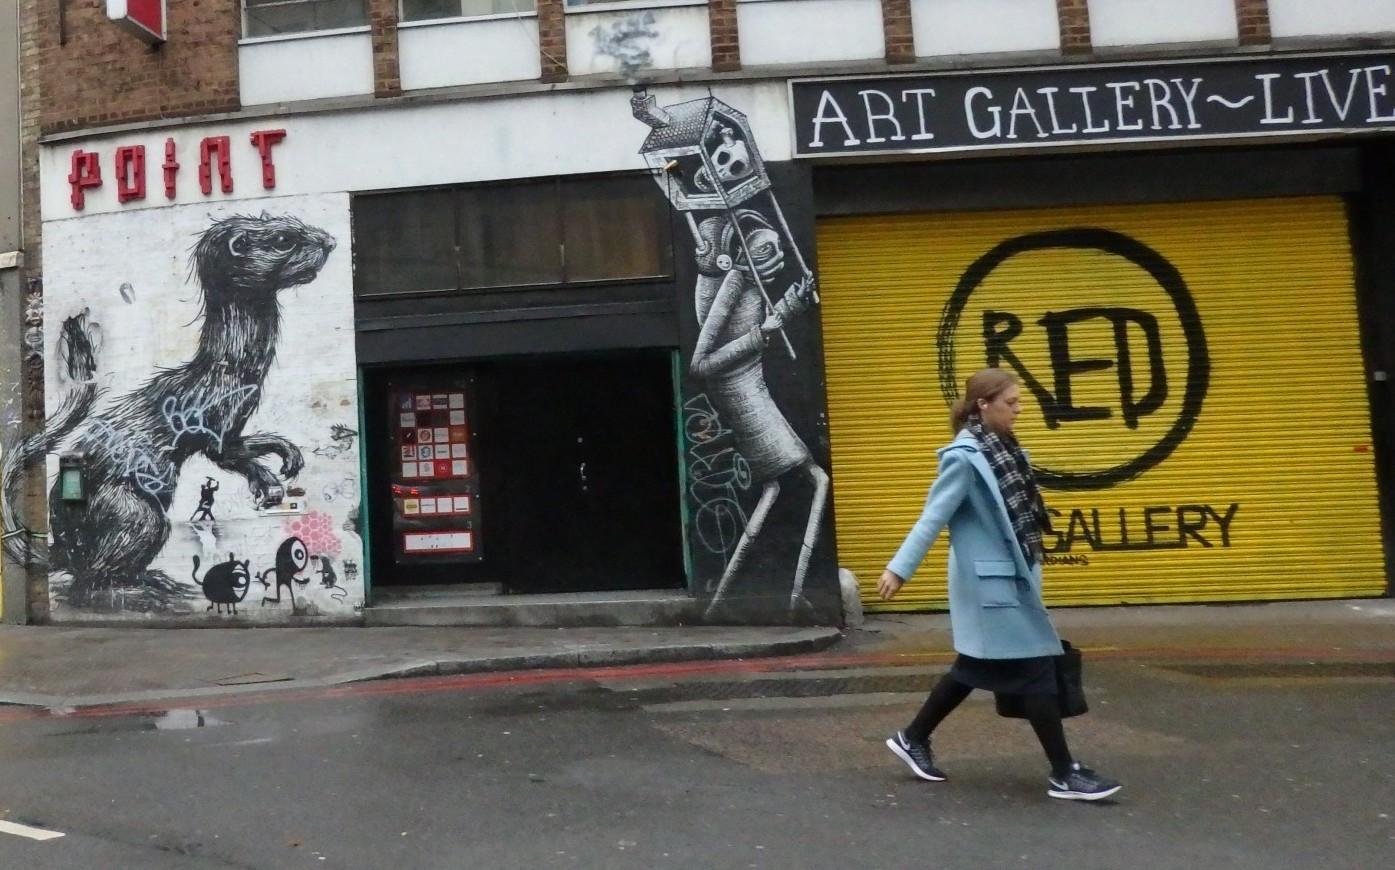 art on an art gallery in Shoreditch, London